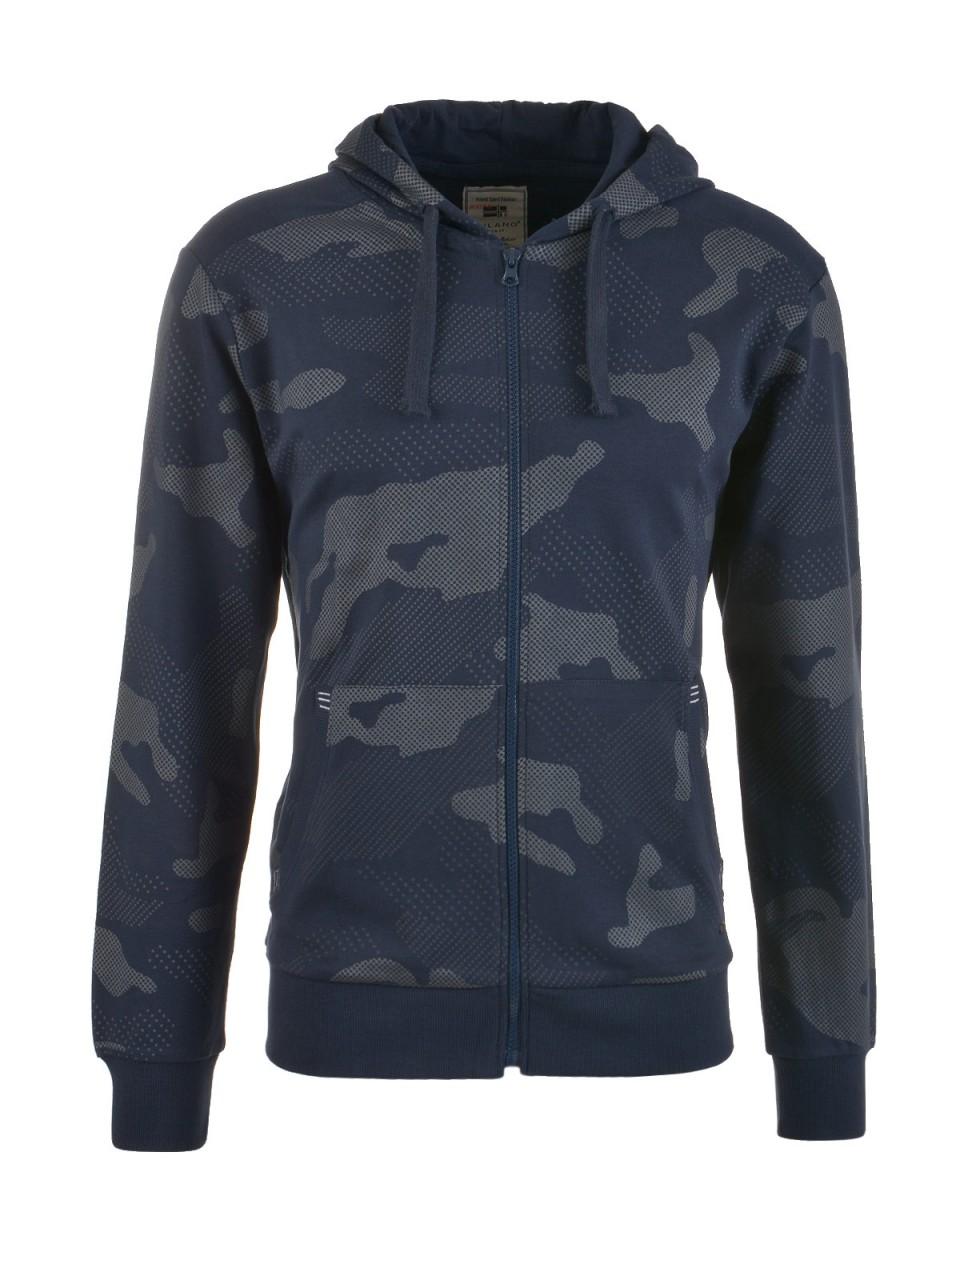 milano-italy-herren-sweatjacke-navy-camouflage